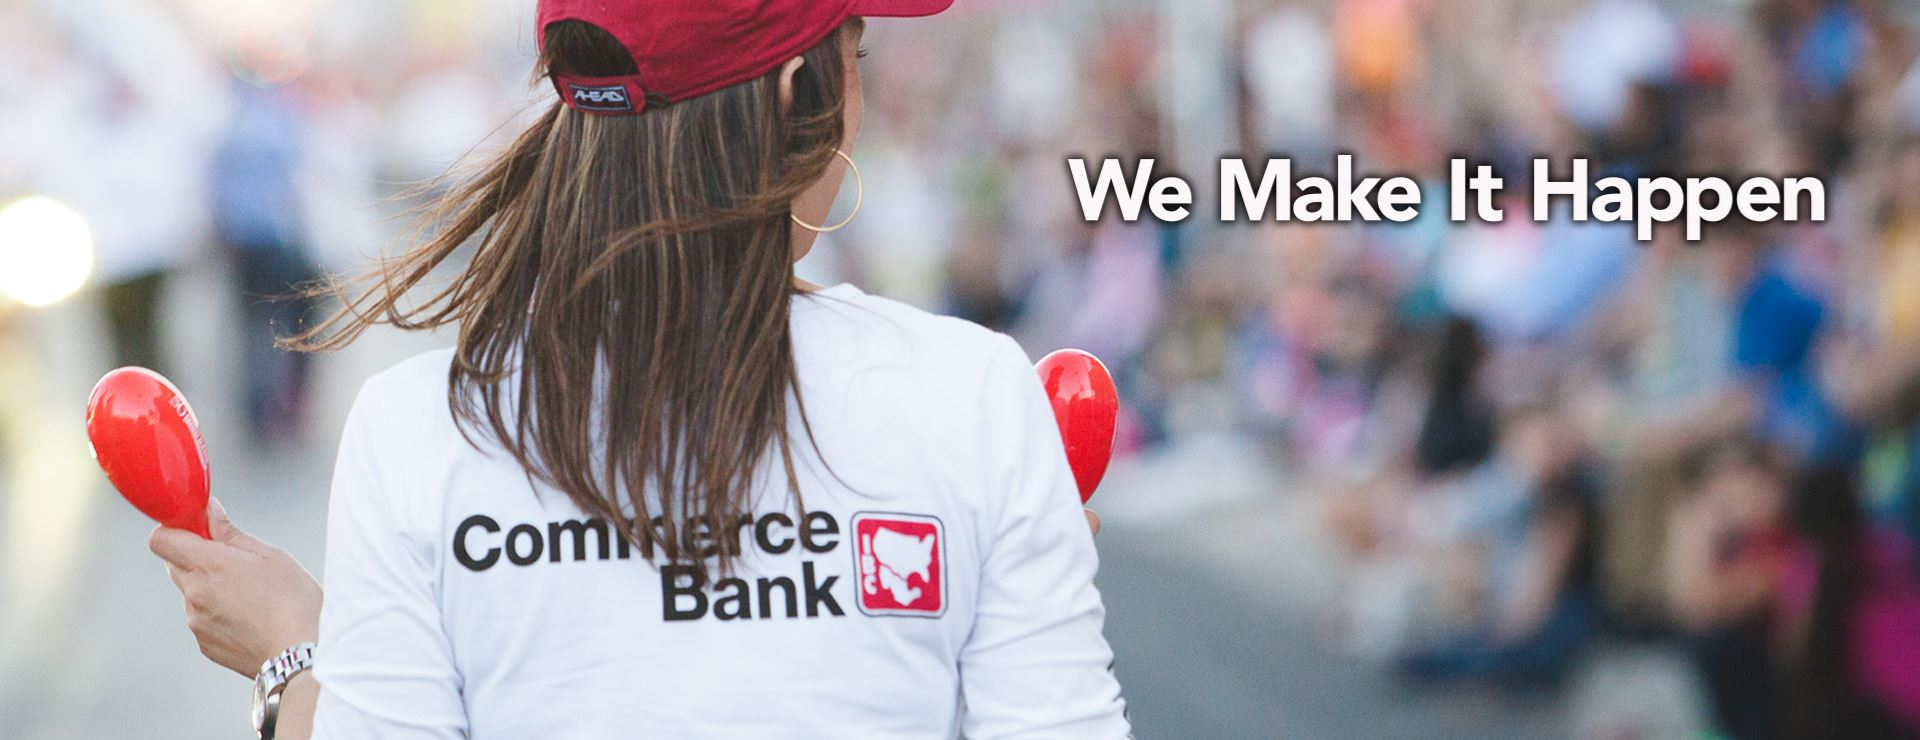 commerce-bank-image1